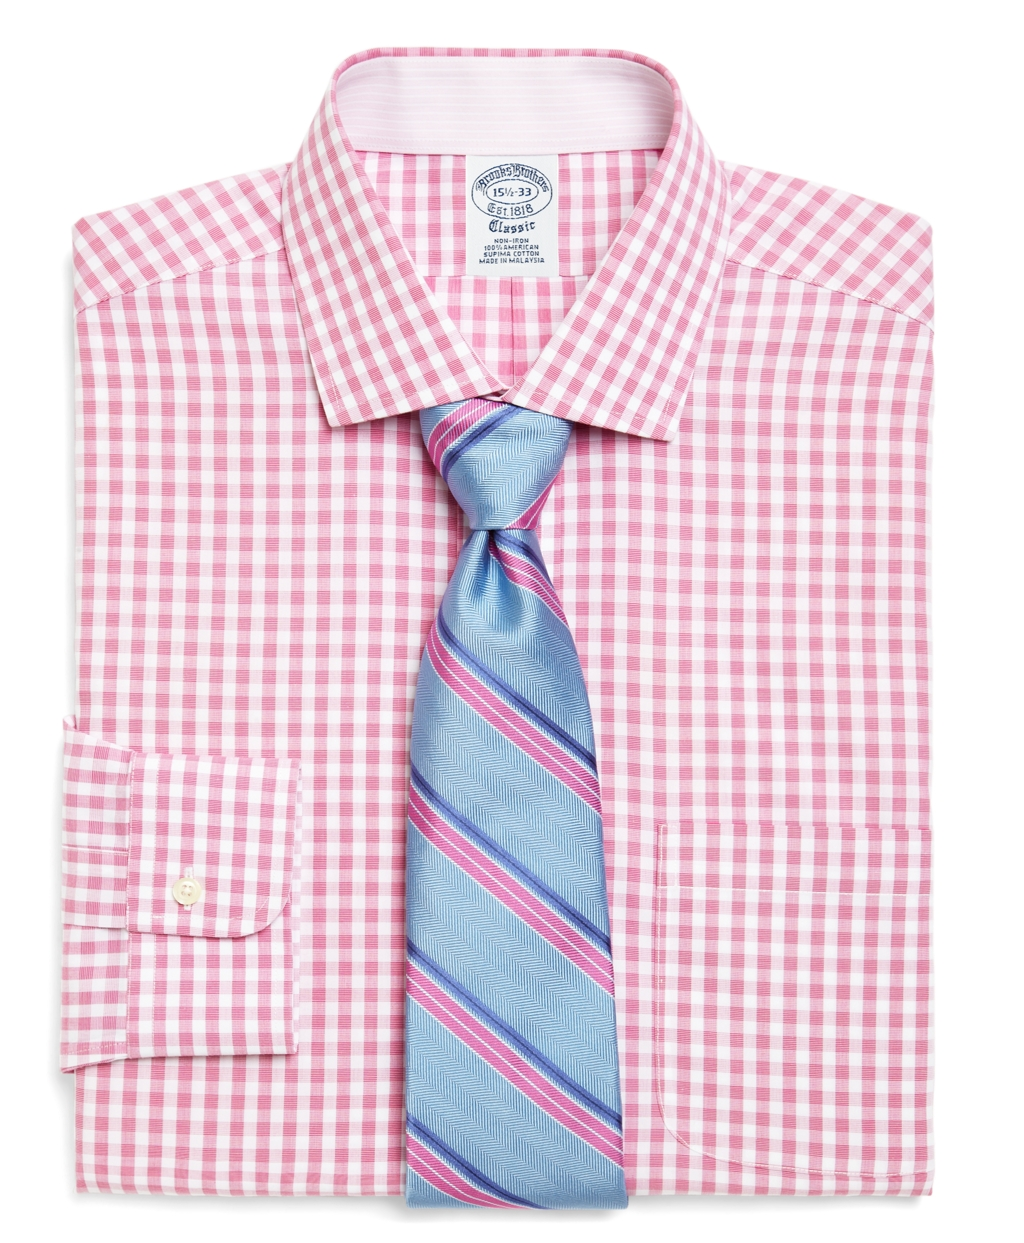 Lyst Brooks Brothers Supima Cotton Noniron Slim Fit Gingham Dress